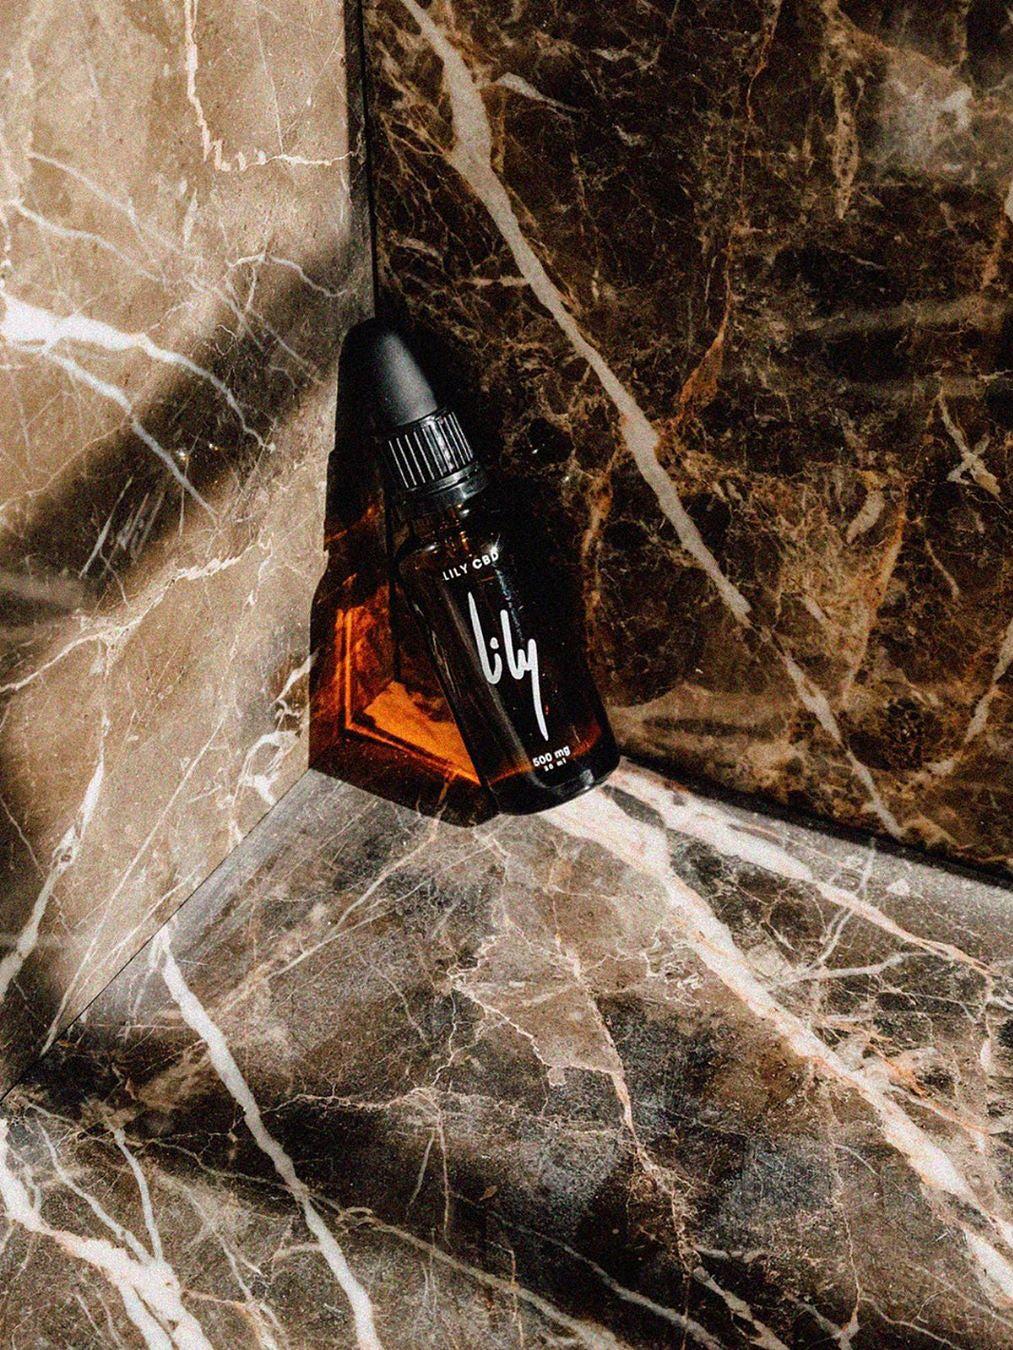 Vial of CBD oil against marble background